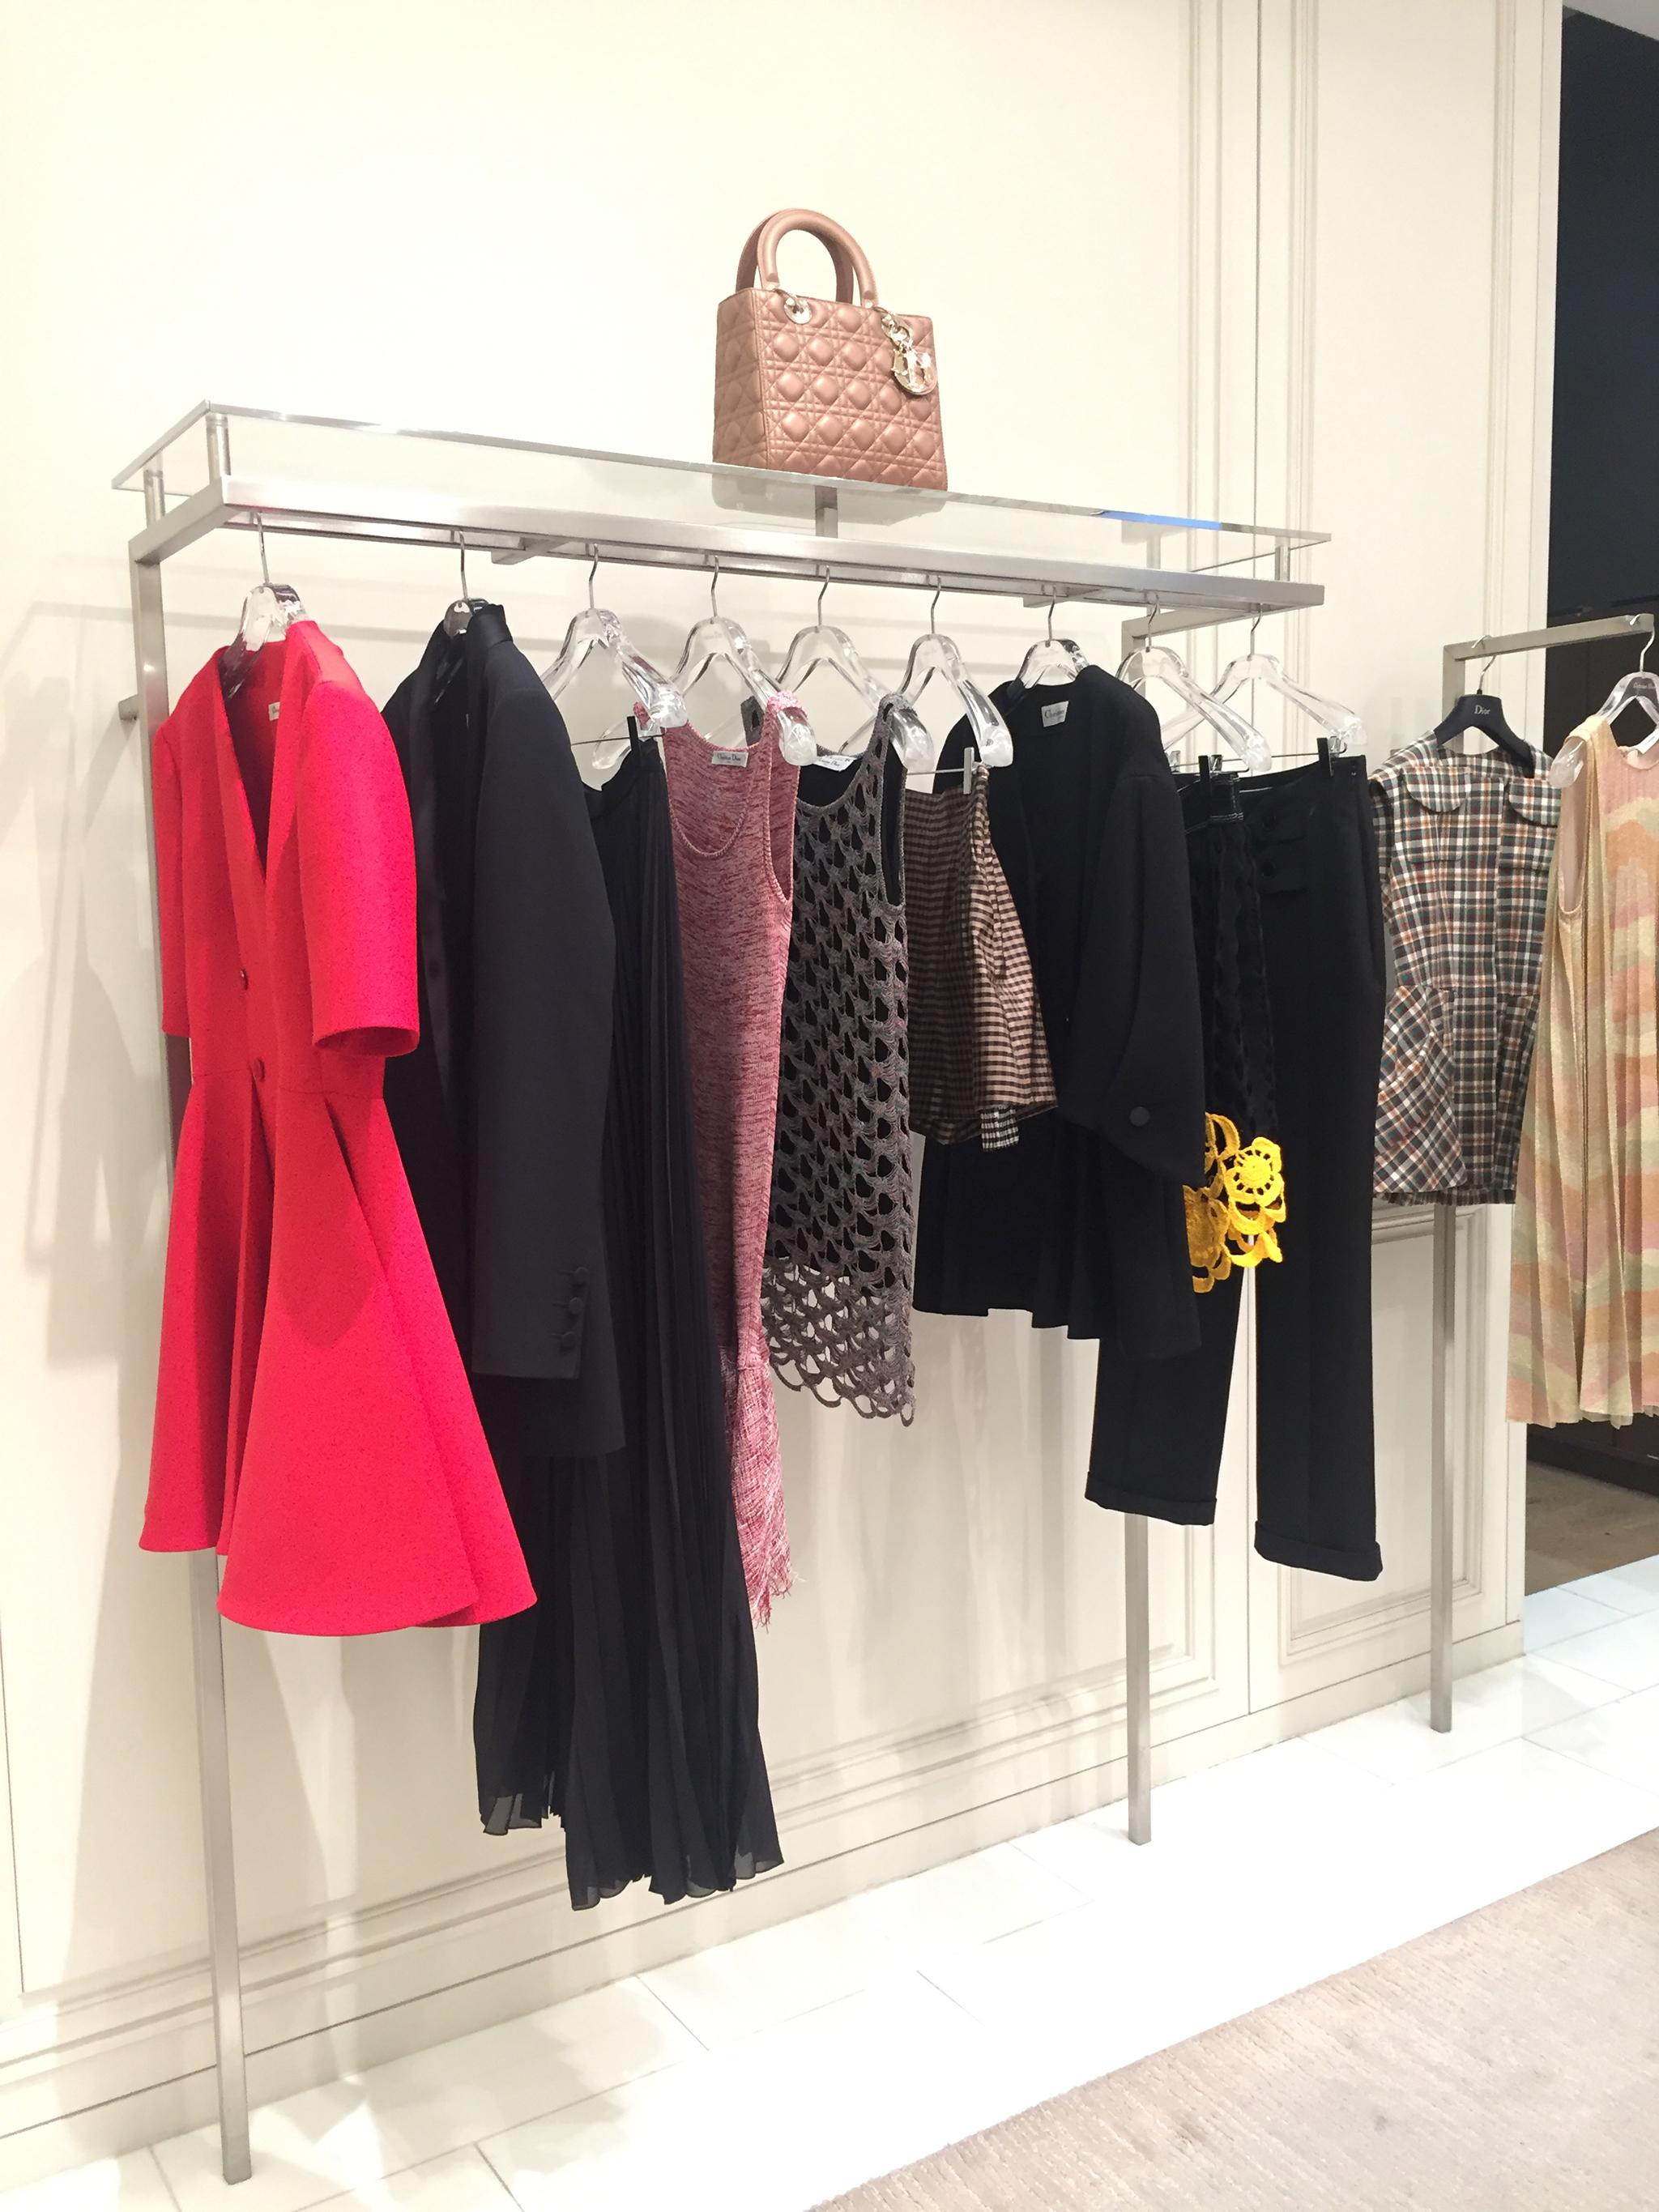 Dior-Saks-5th-Ave-02